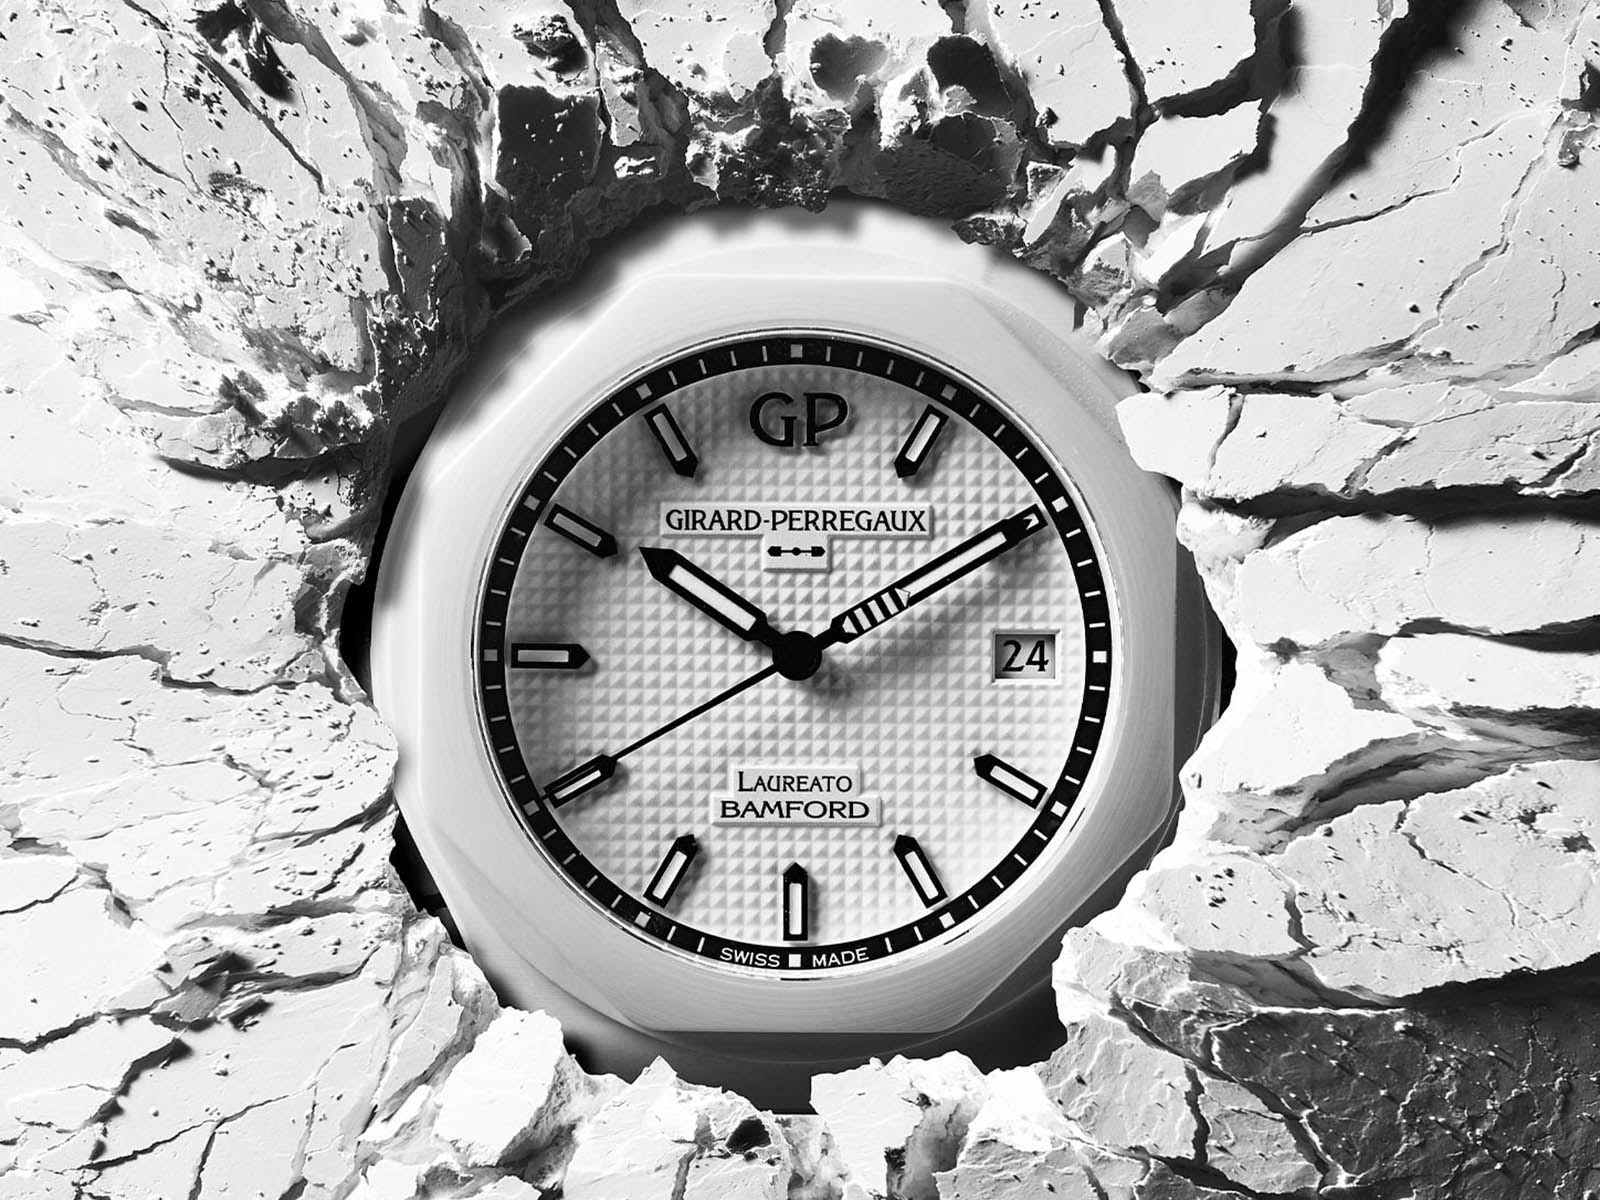 81005-32-733-ub7a-girard-perregaux-laureato-ghost-limited-edition-2.jpg